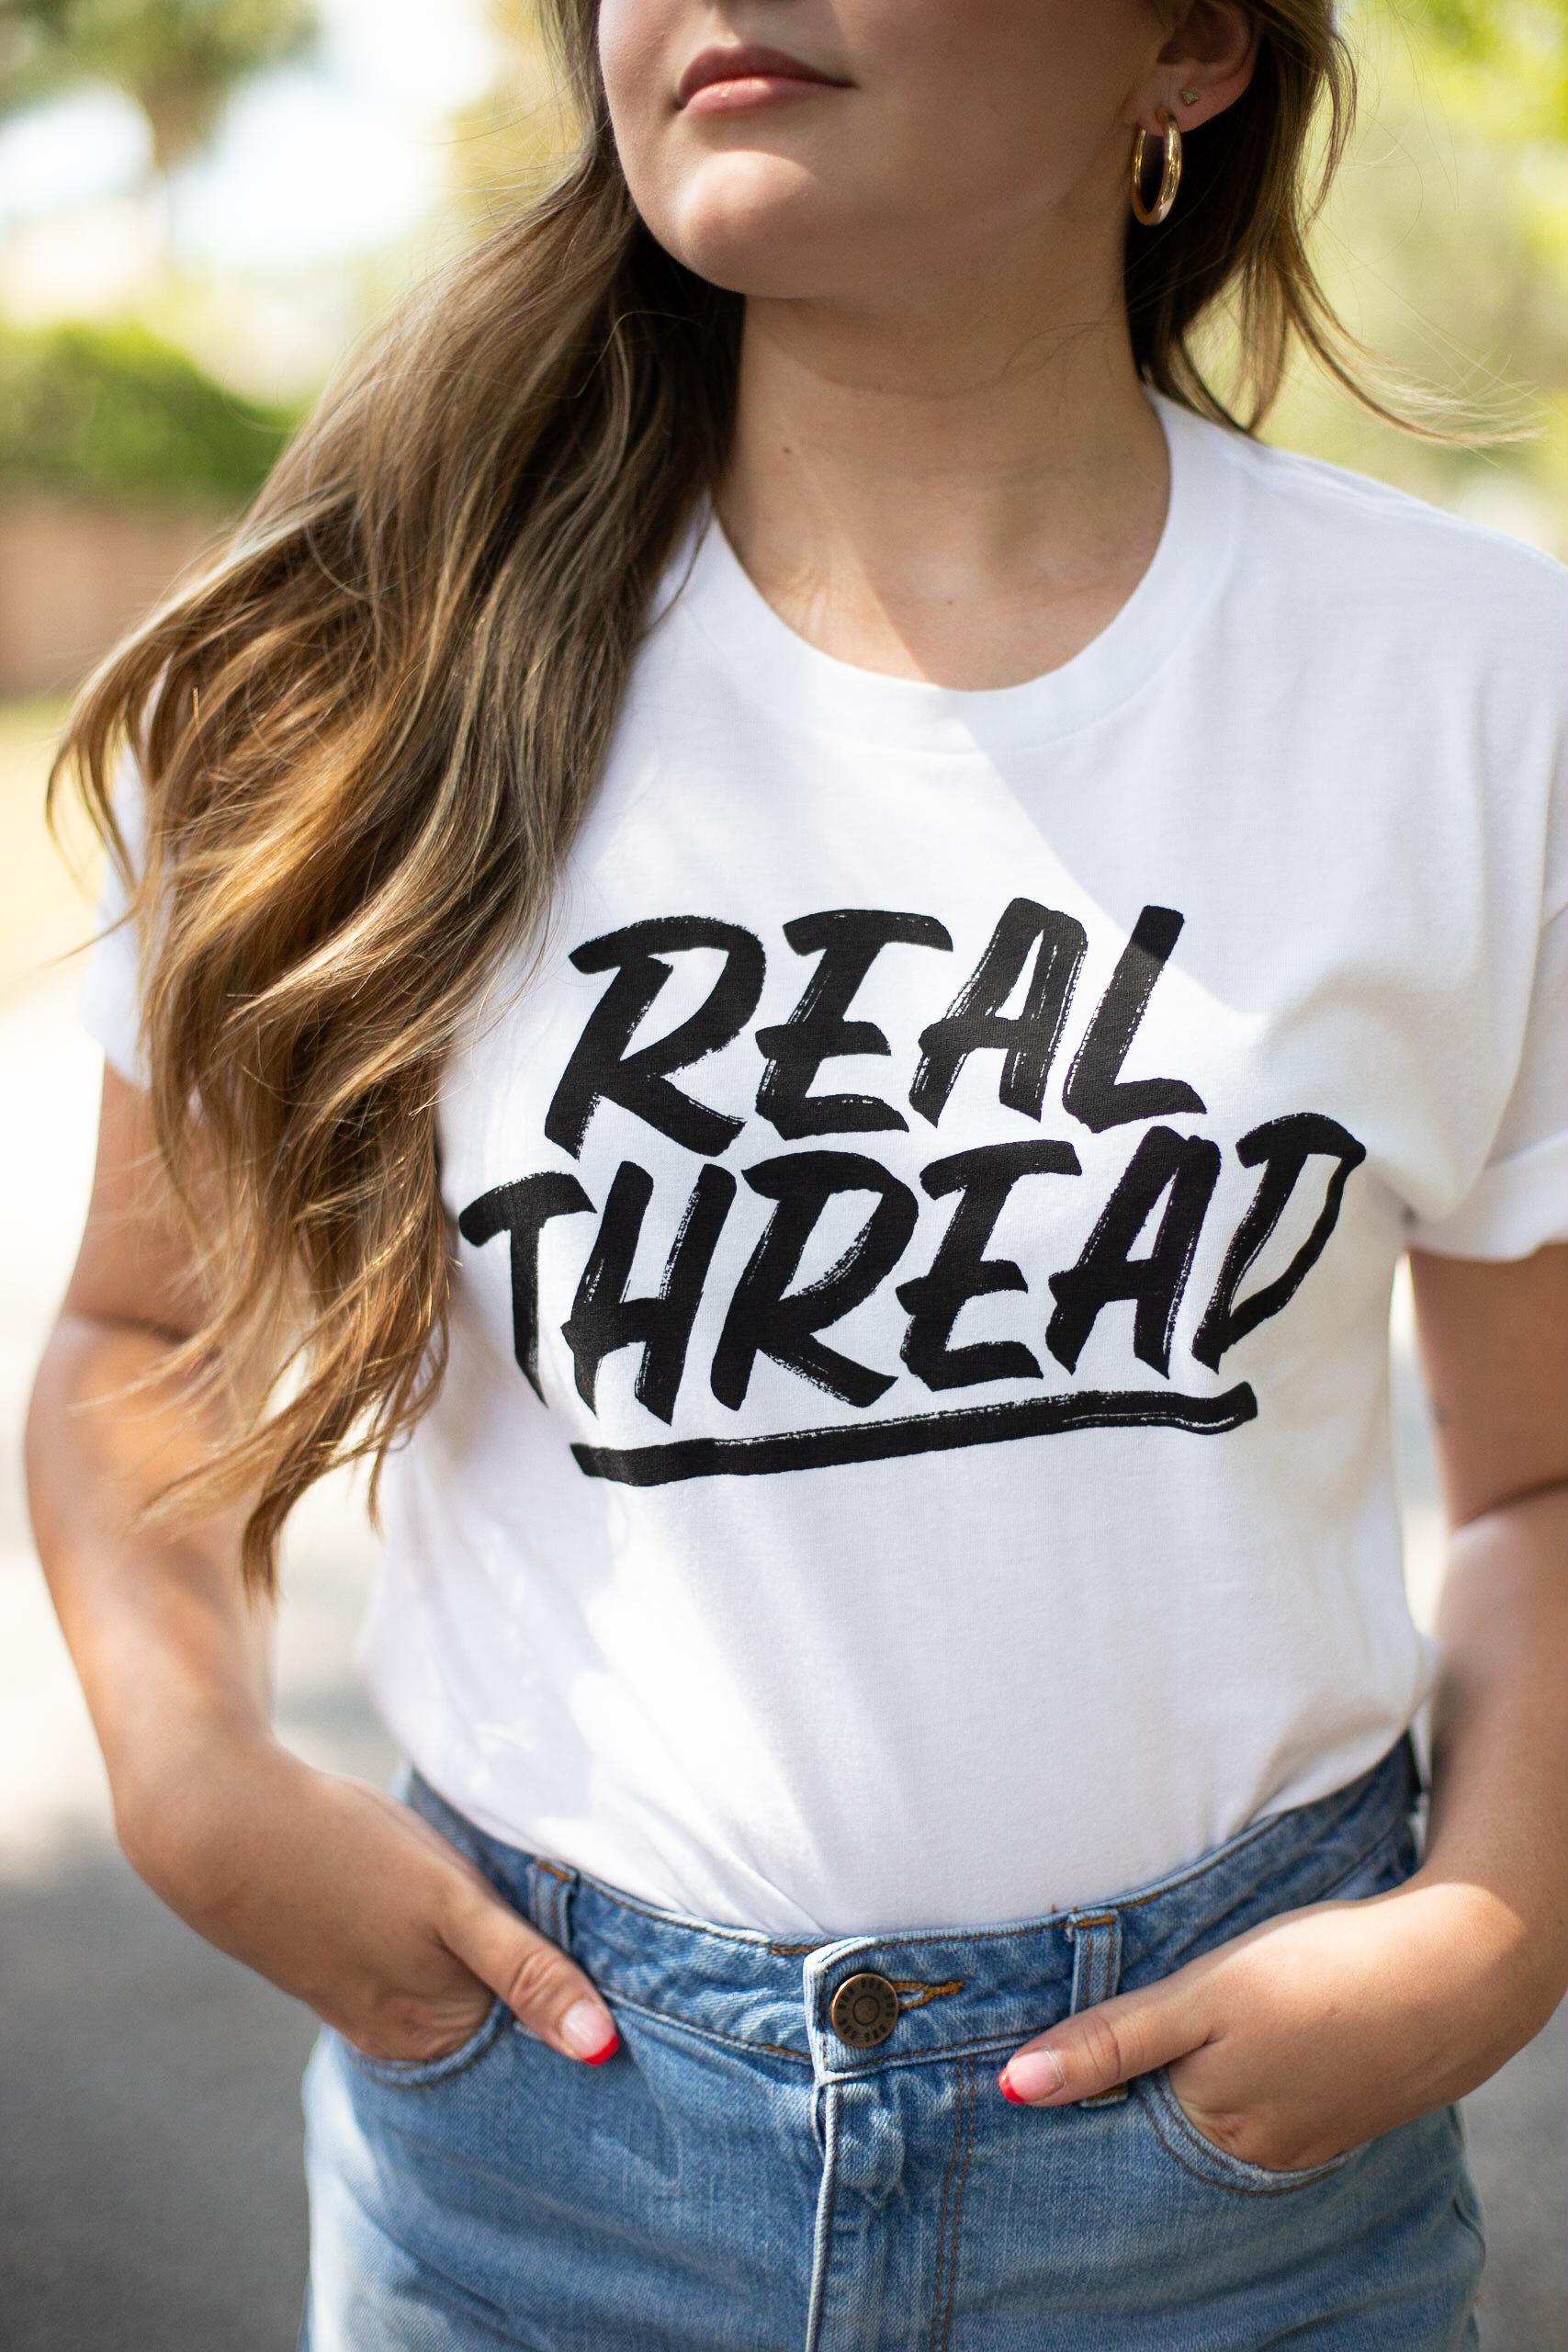 A girl wears a white Real Thread custom printed t-shirt.